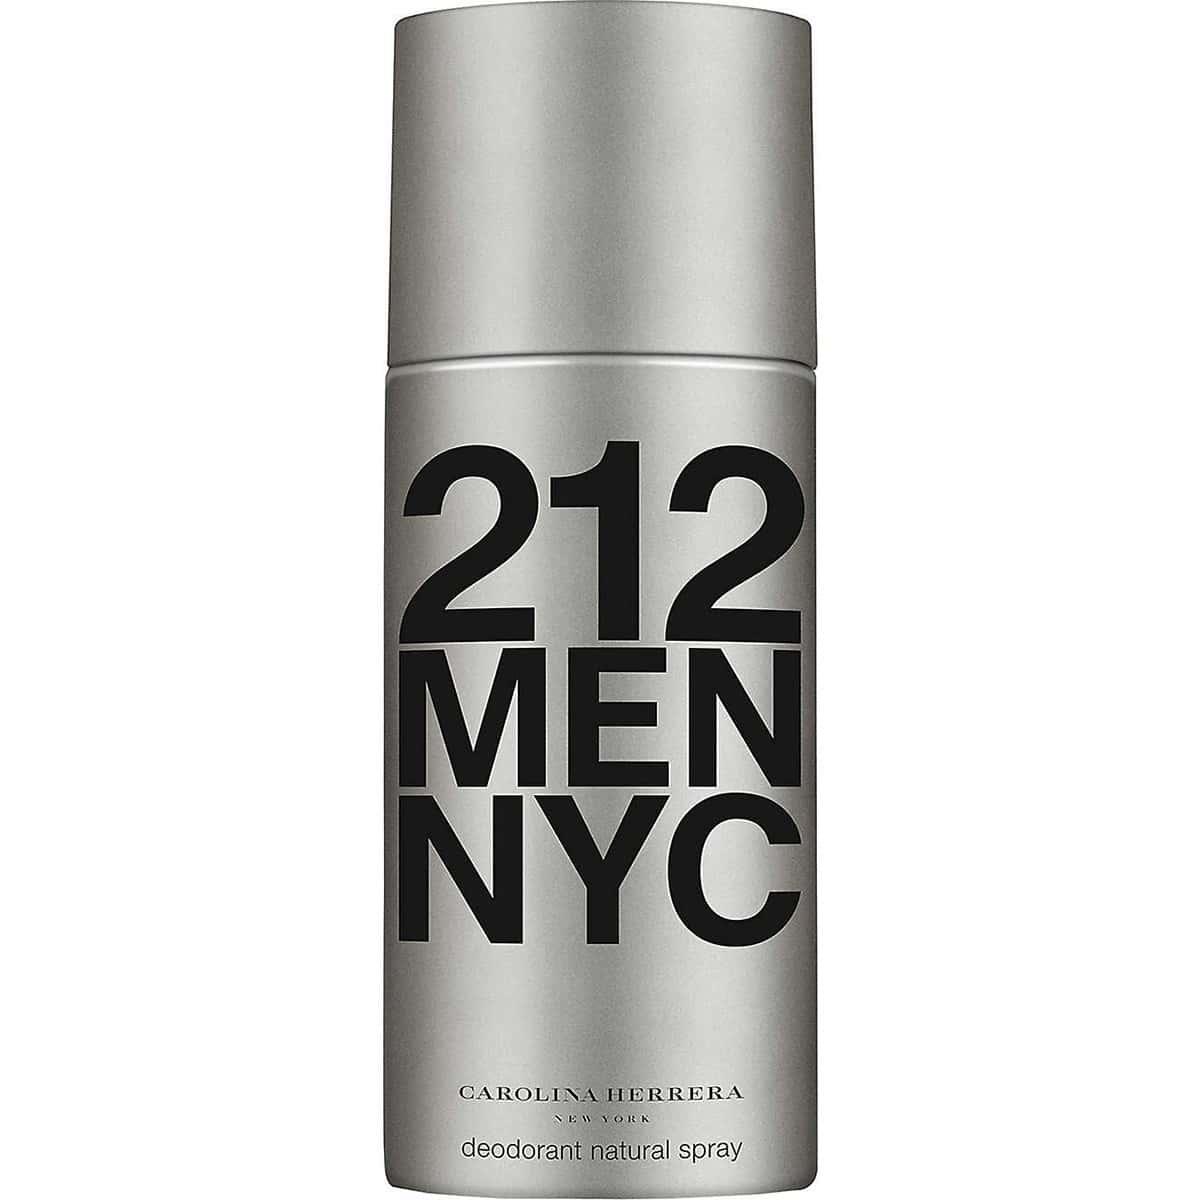 Carolina Herrera 212 Men NYC Deo Spray 150ml